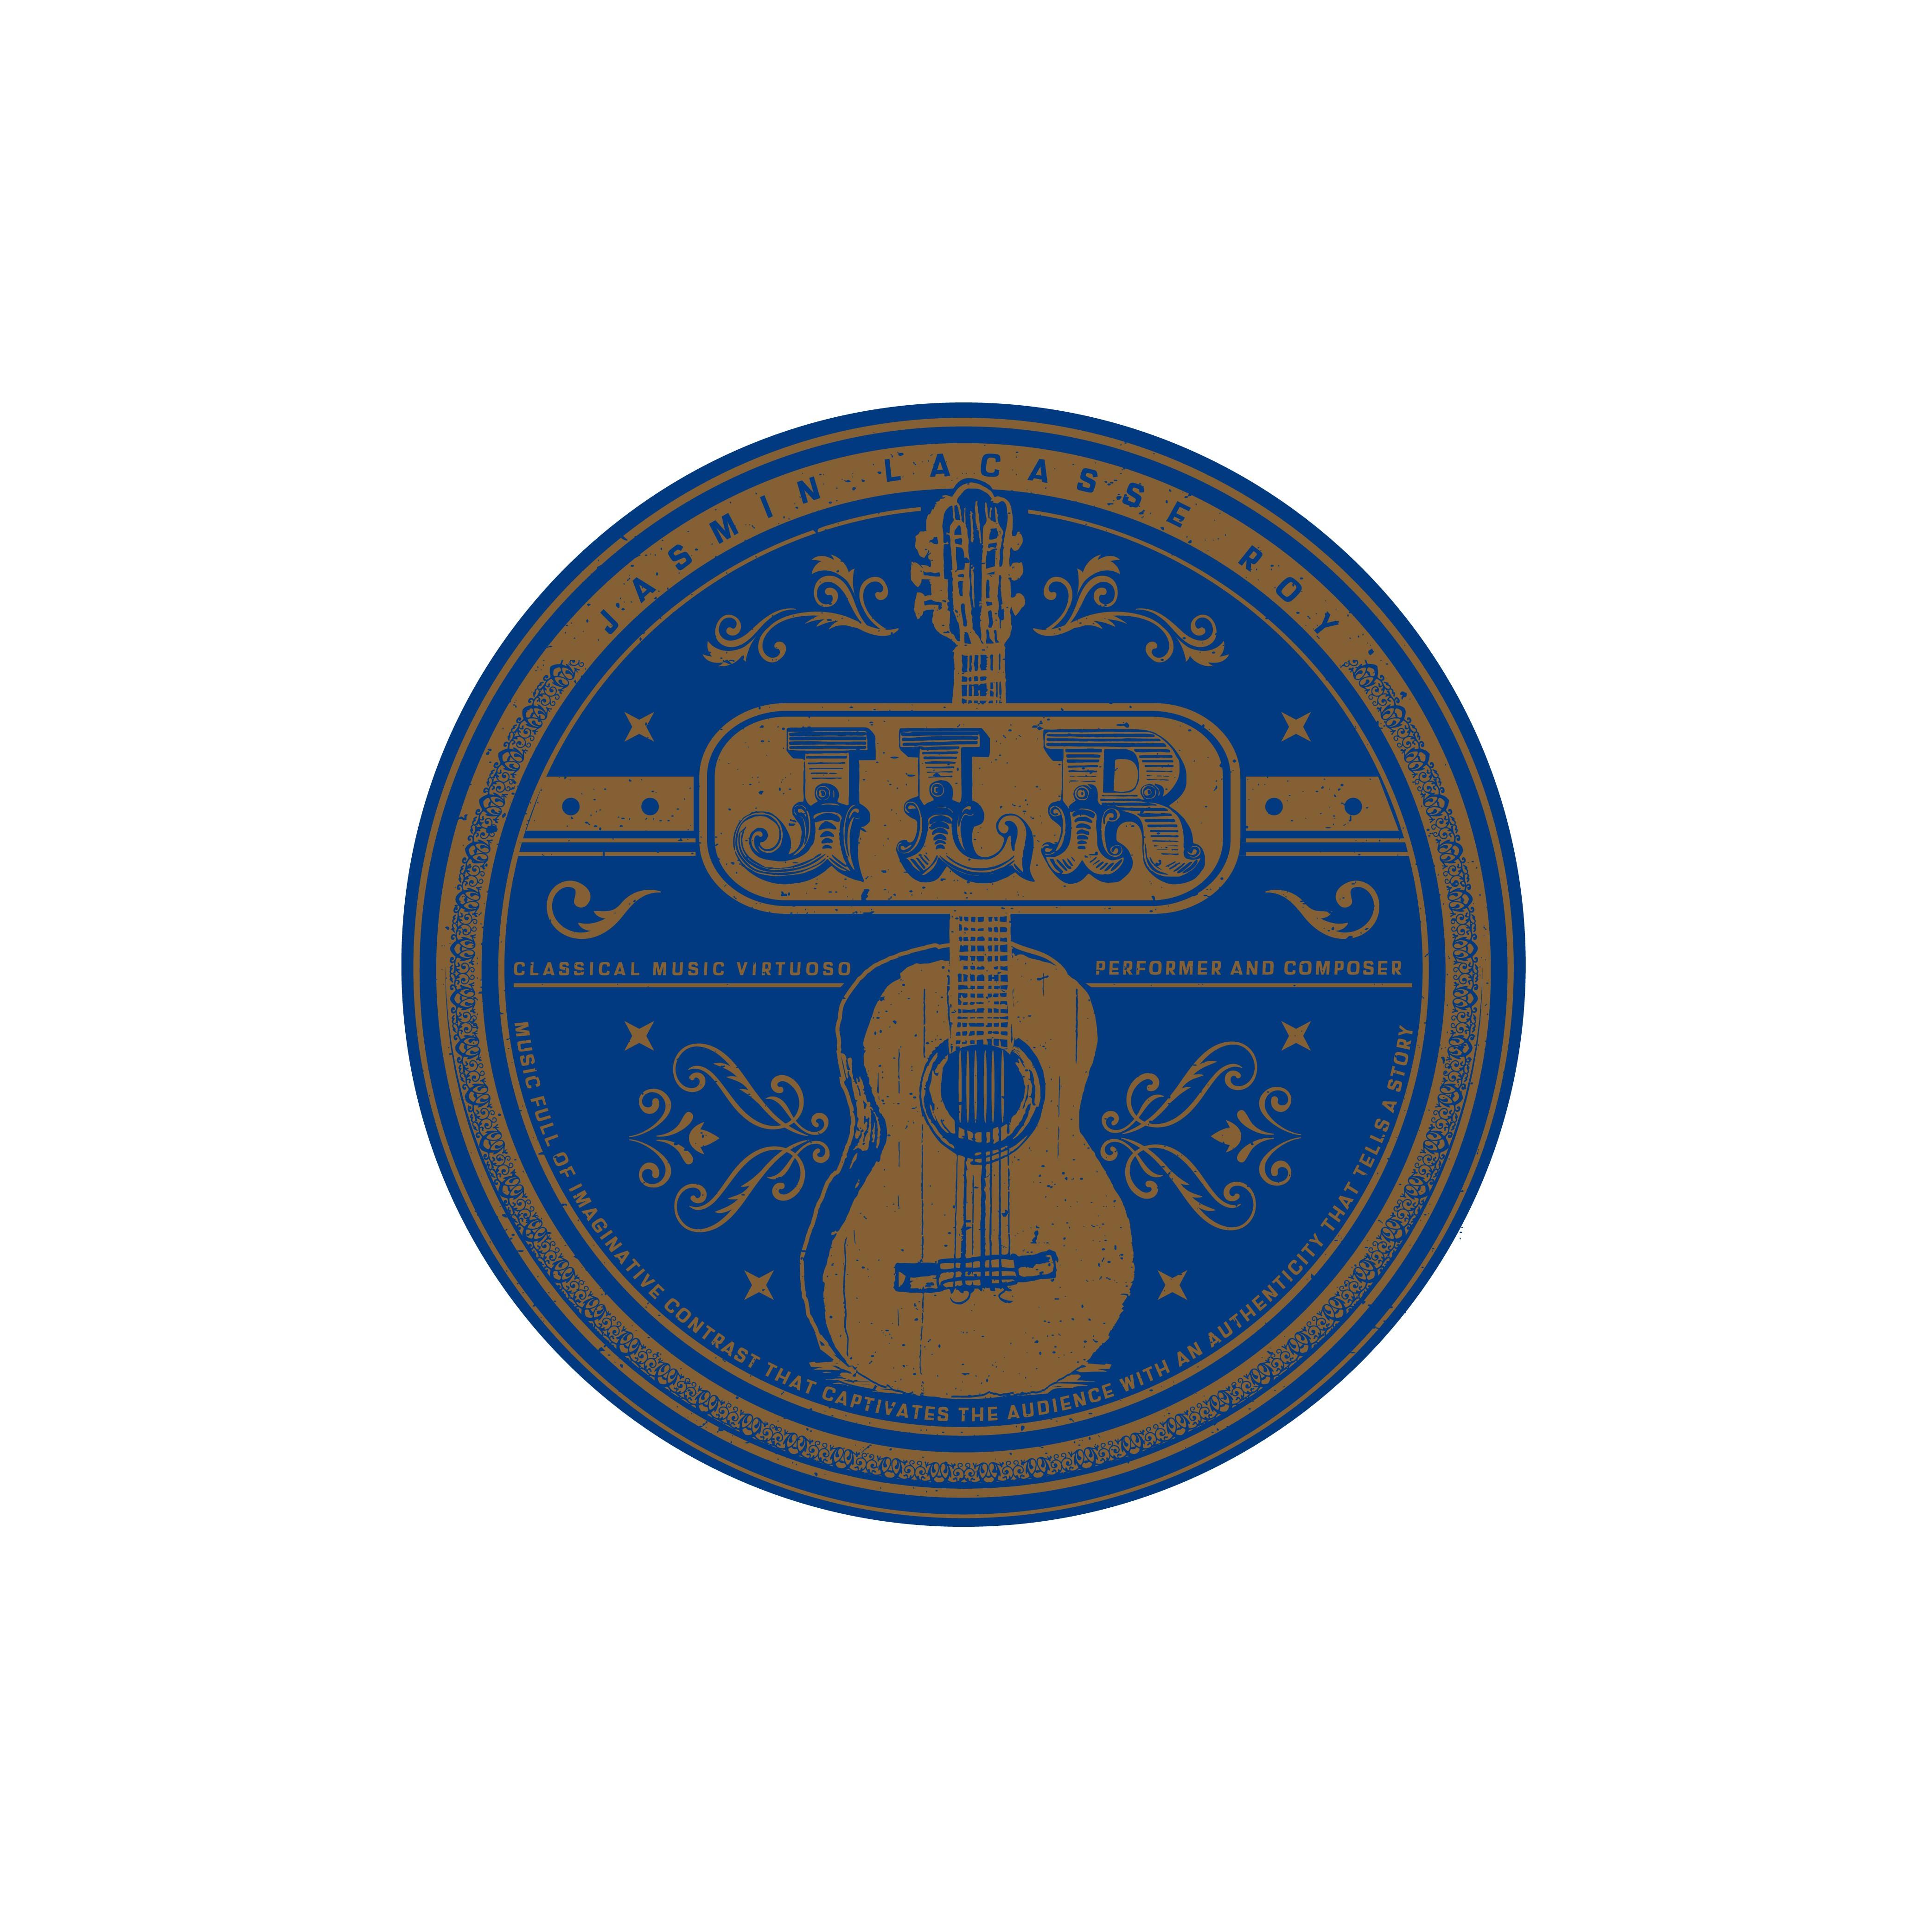 hand drawn Logo for a classical music virtuoso.